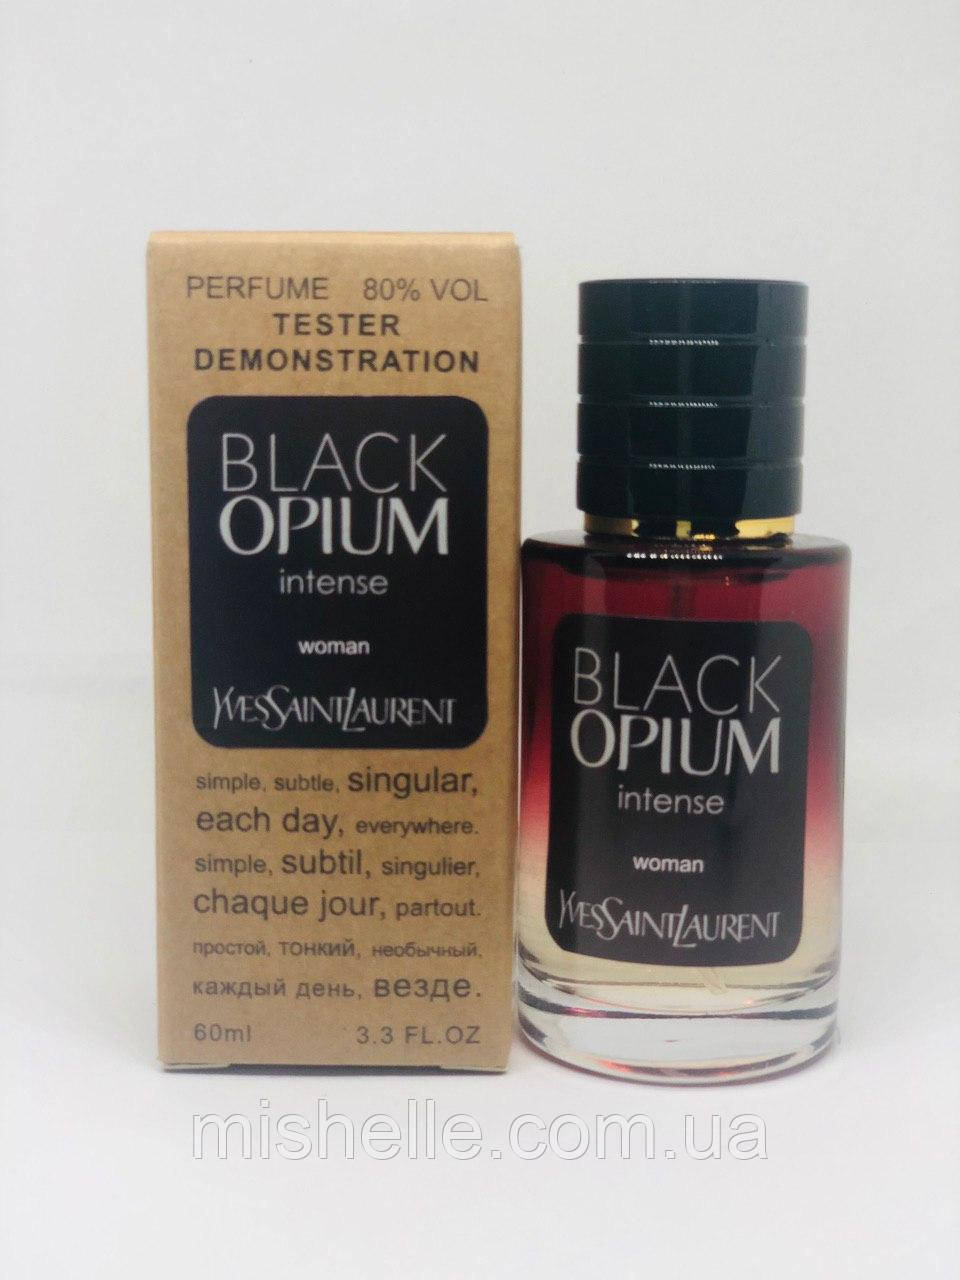 Тестер Yves Saint Laurent Black Opium Intense 60мл (Ив Сен Лоран Блек Опиум Интенс)